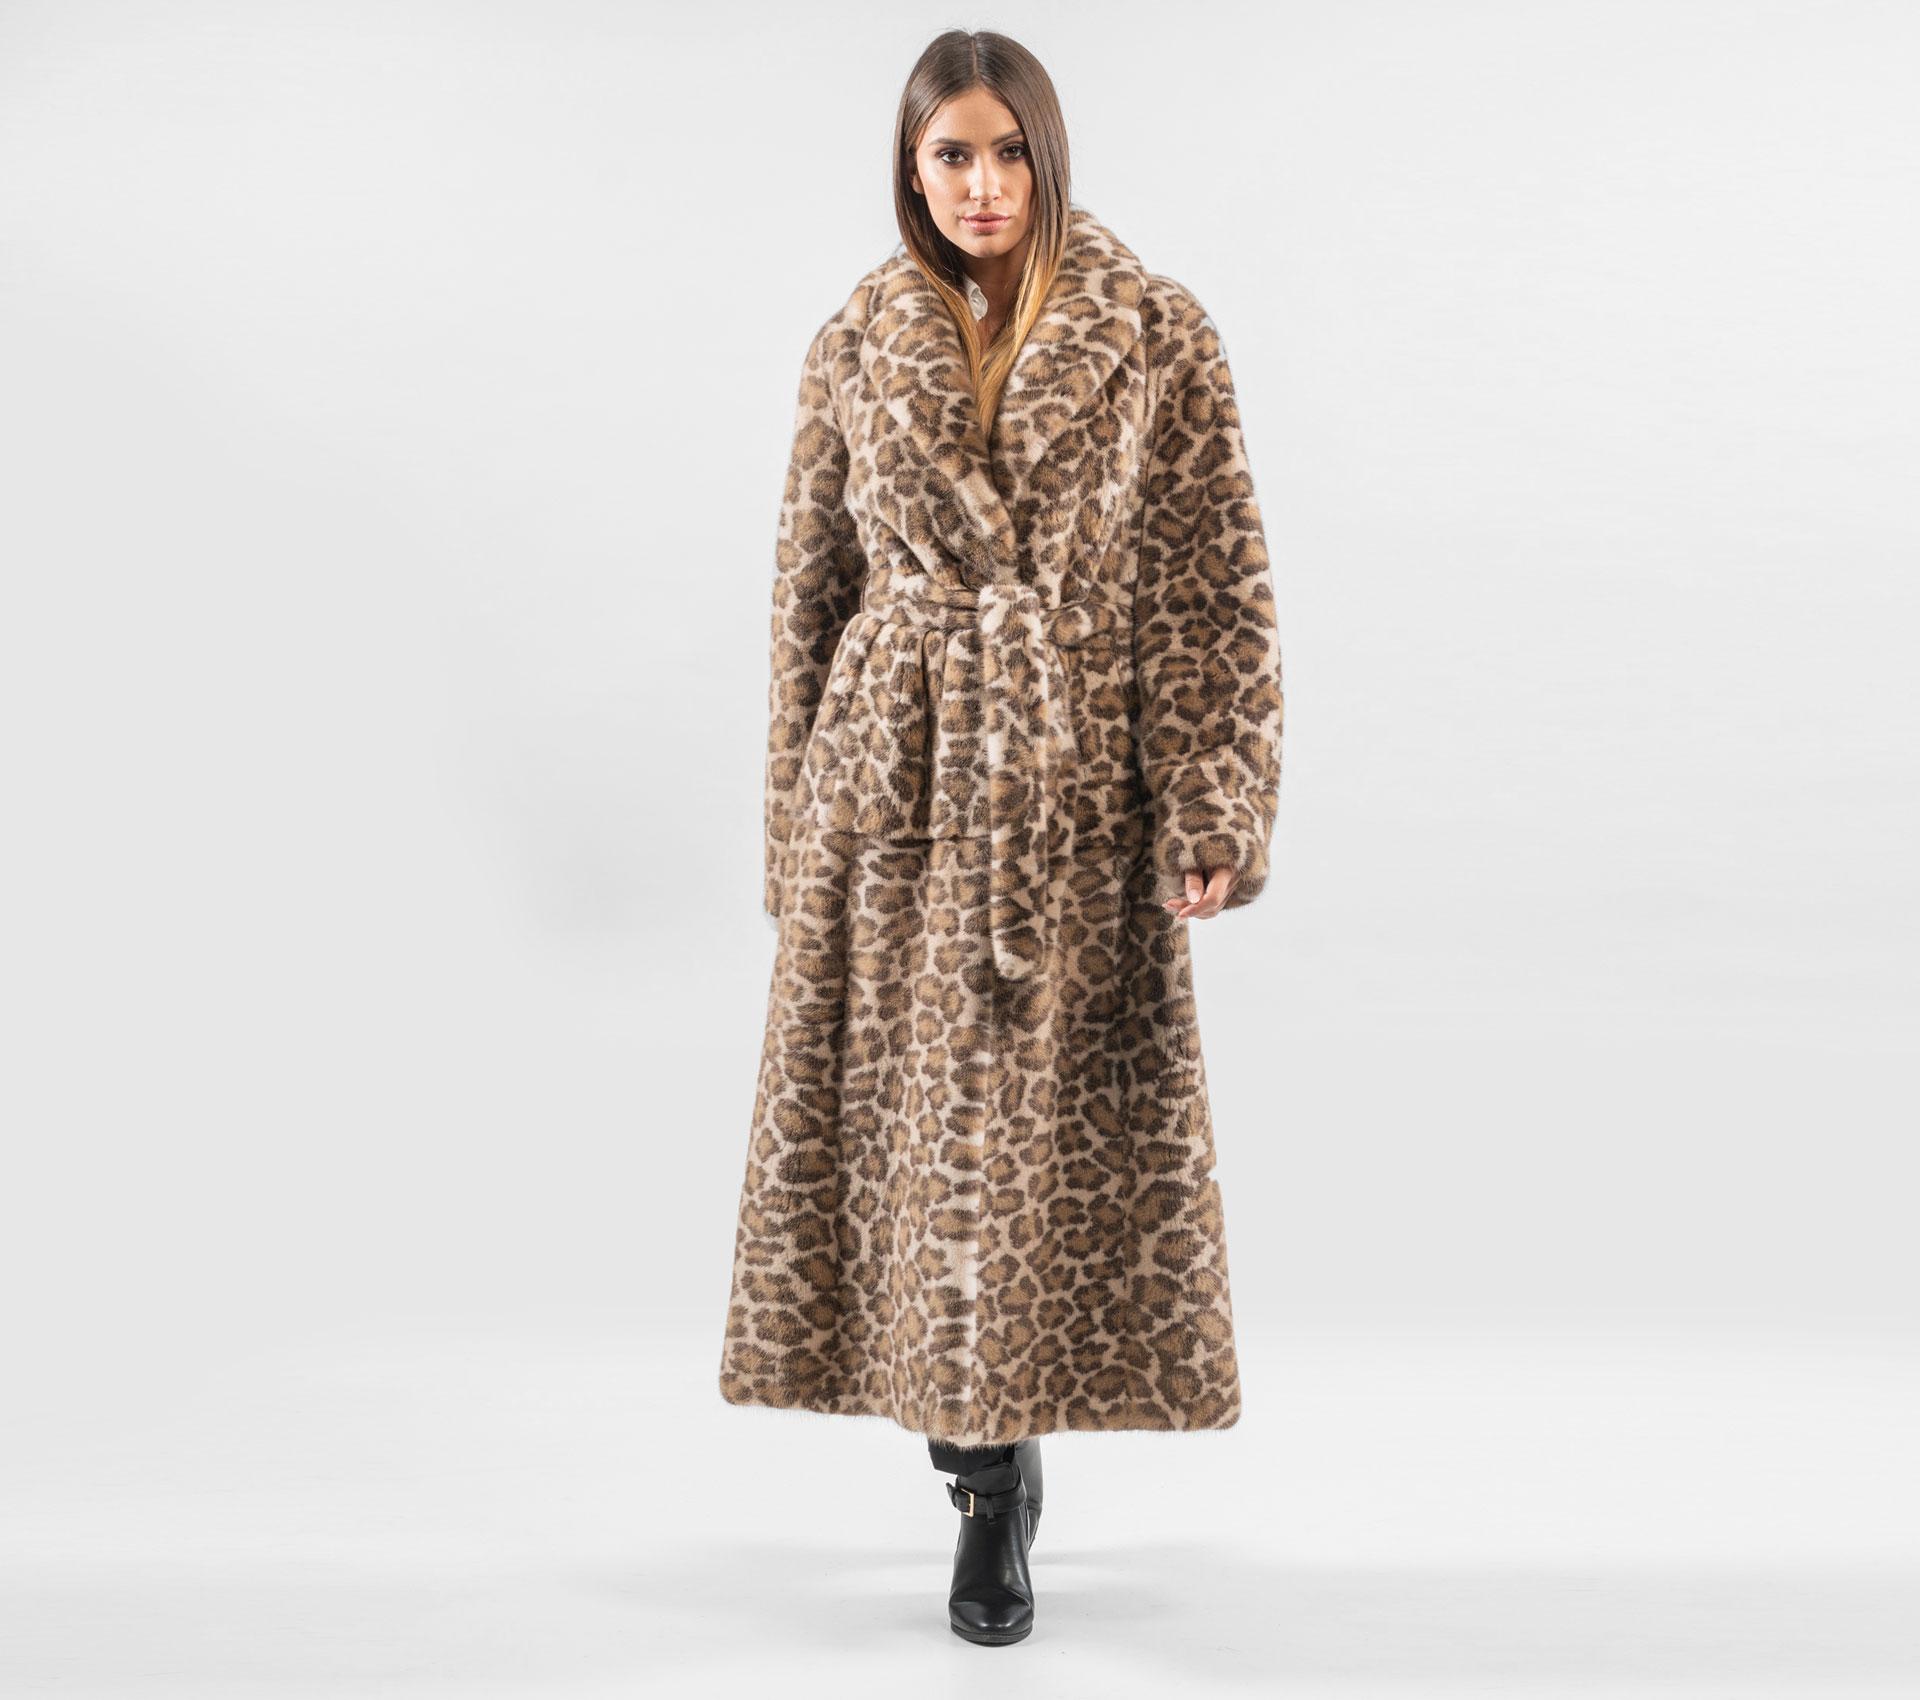 Spiksplinternieuw Palomino Leopard Mink Fur Coat - 100% Real Fur - Haute Acorn GT-89